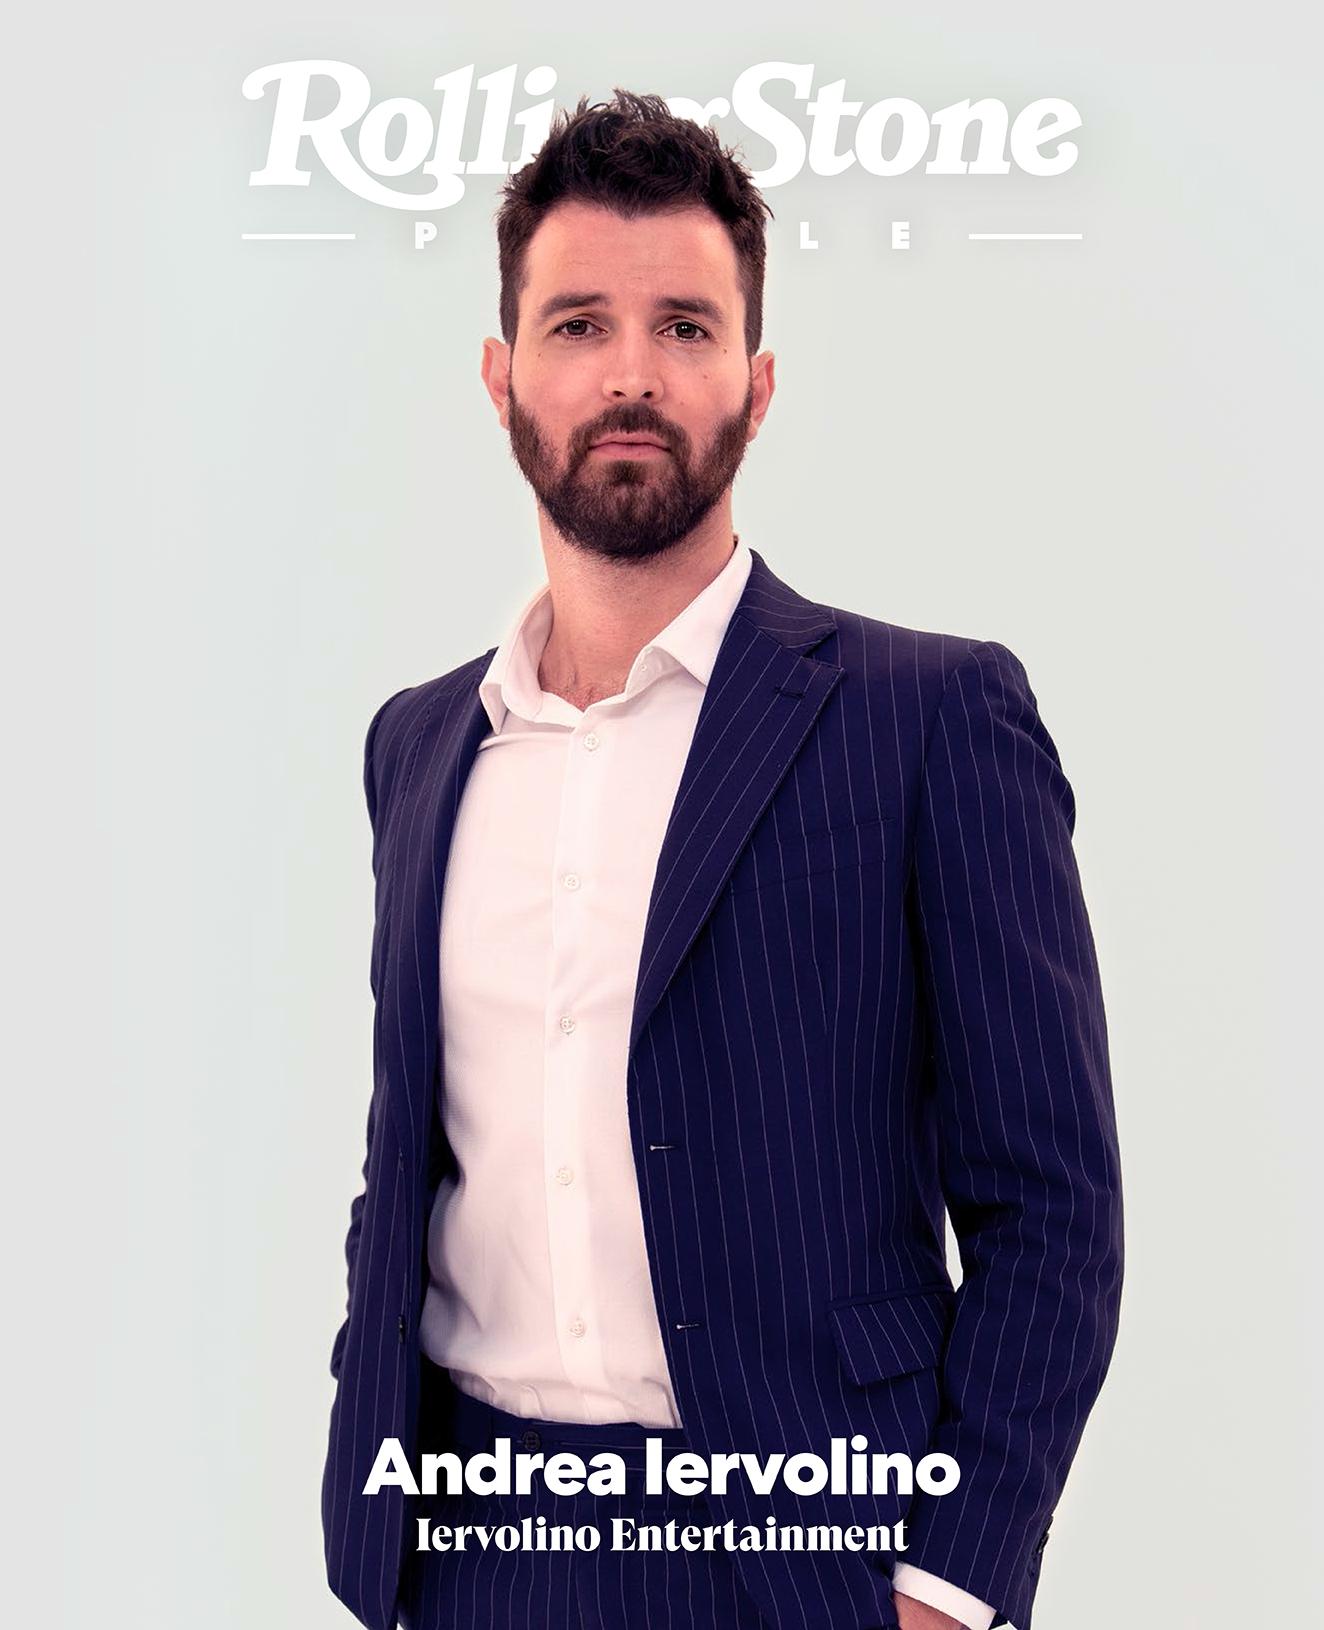 Andrea Iervolino digital cover Rolling Stone Italia